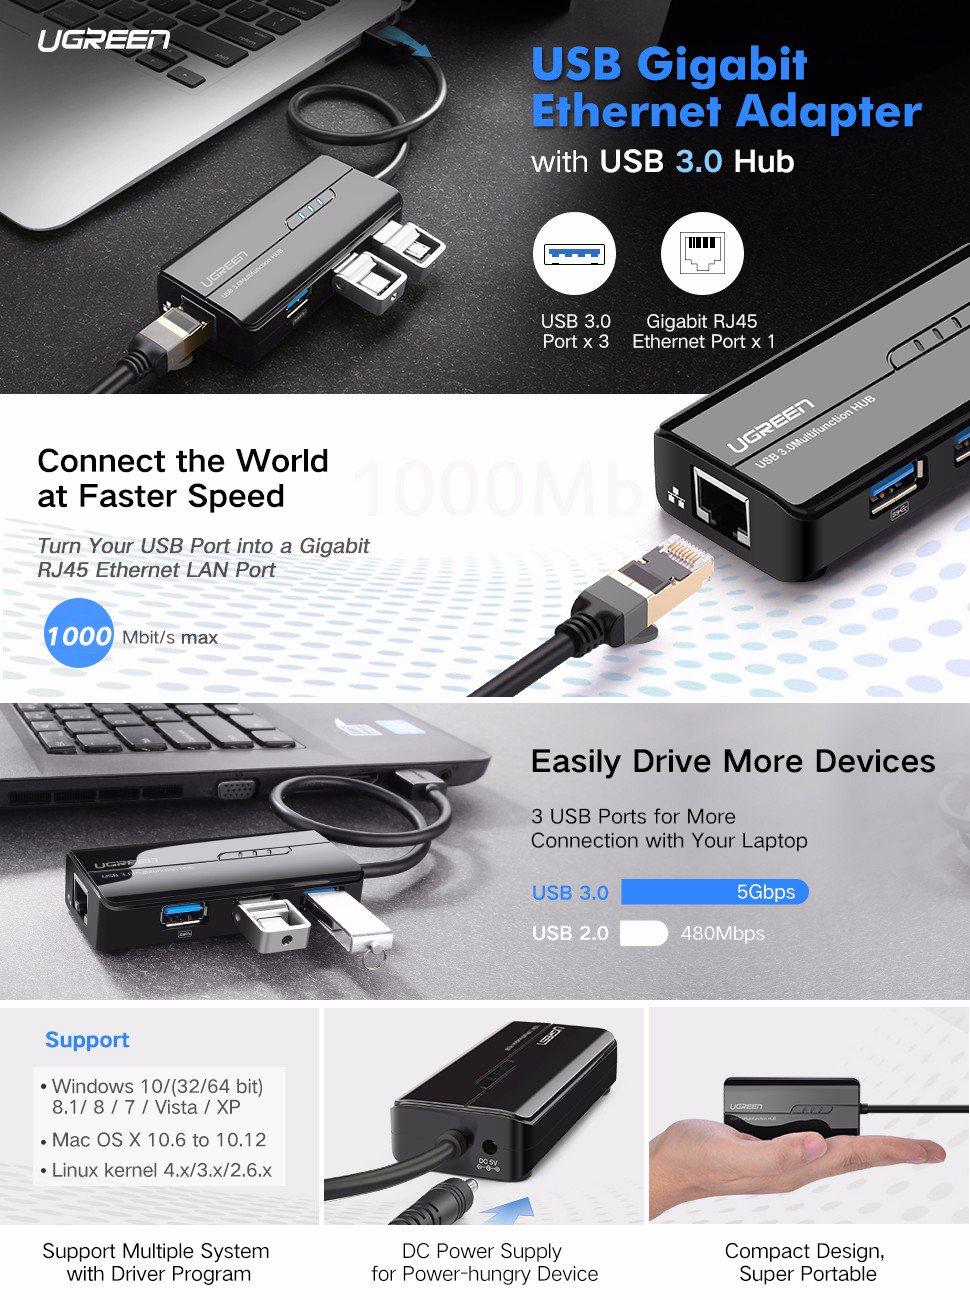 UGREEN Gigabit Ethernet Adapter with 3 Port USB 3.0 Hub